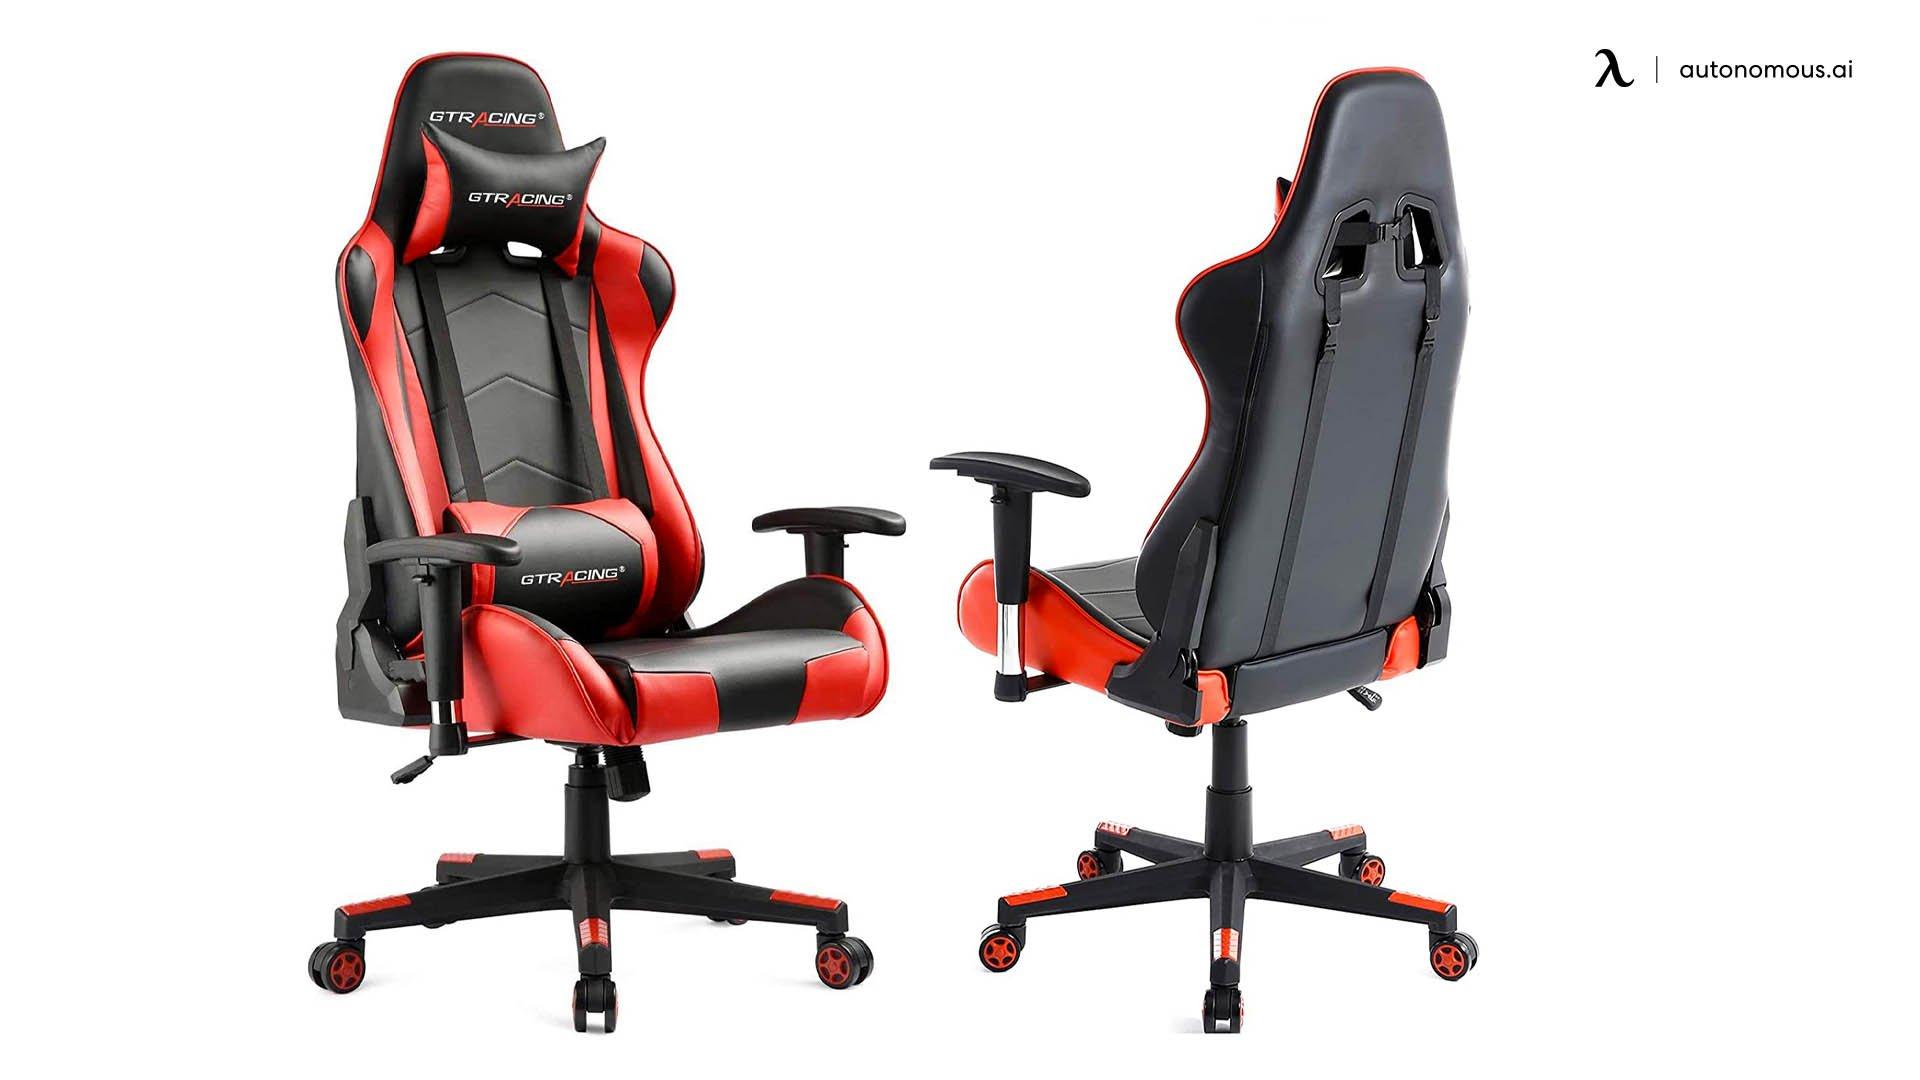 GT Racing Chair